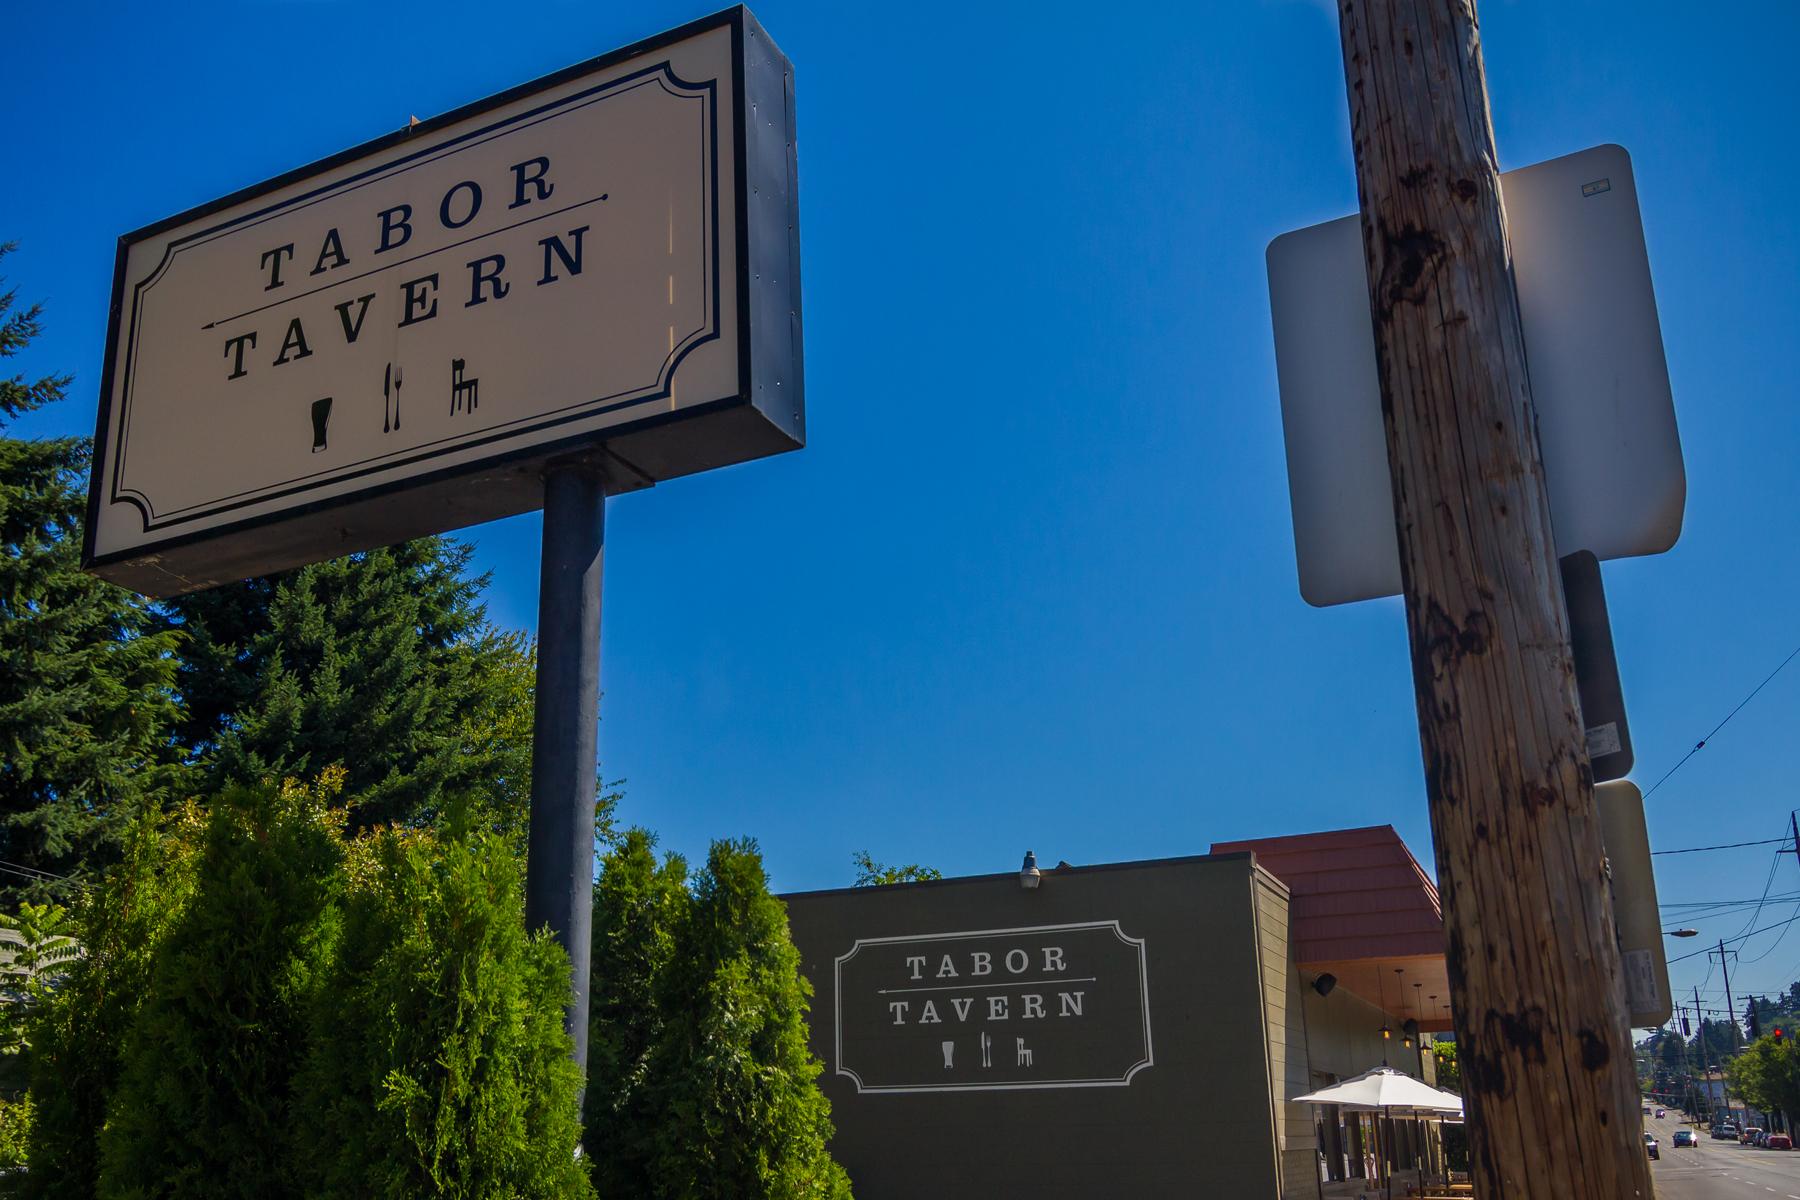 Tabor Tavern